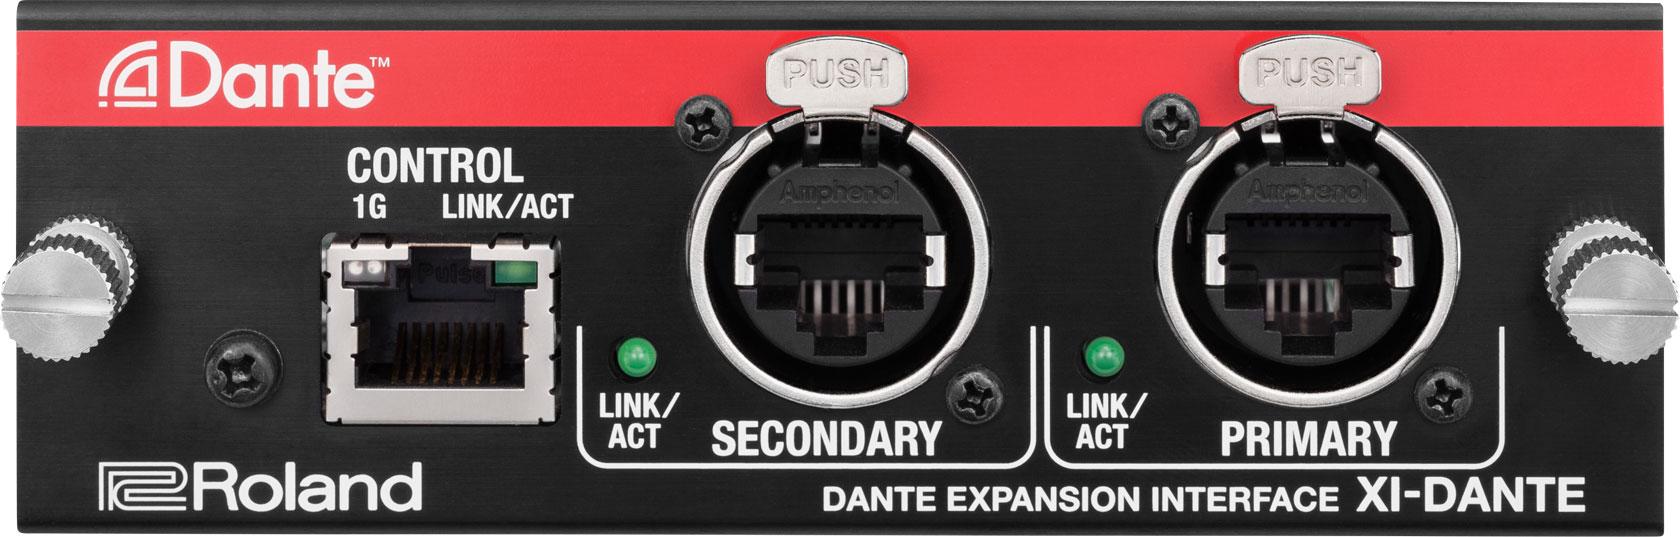 Roland Pro A/V - XI-DANTE | DANTE Expansion Interface